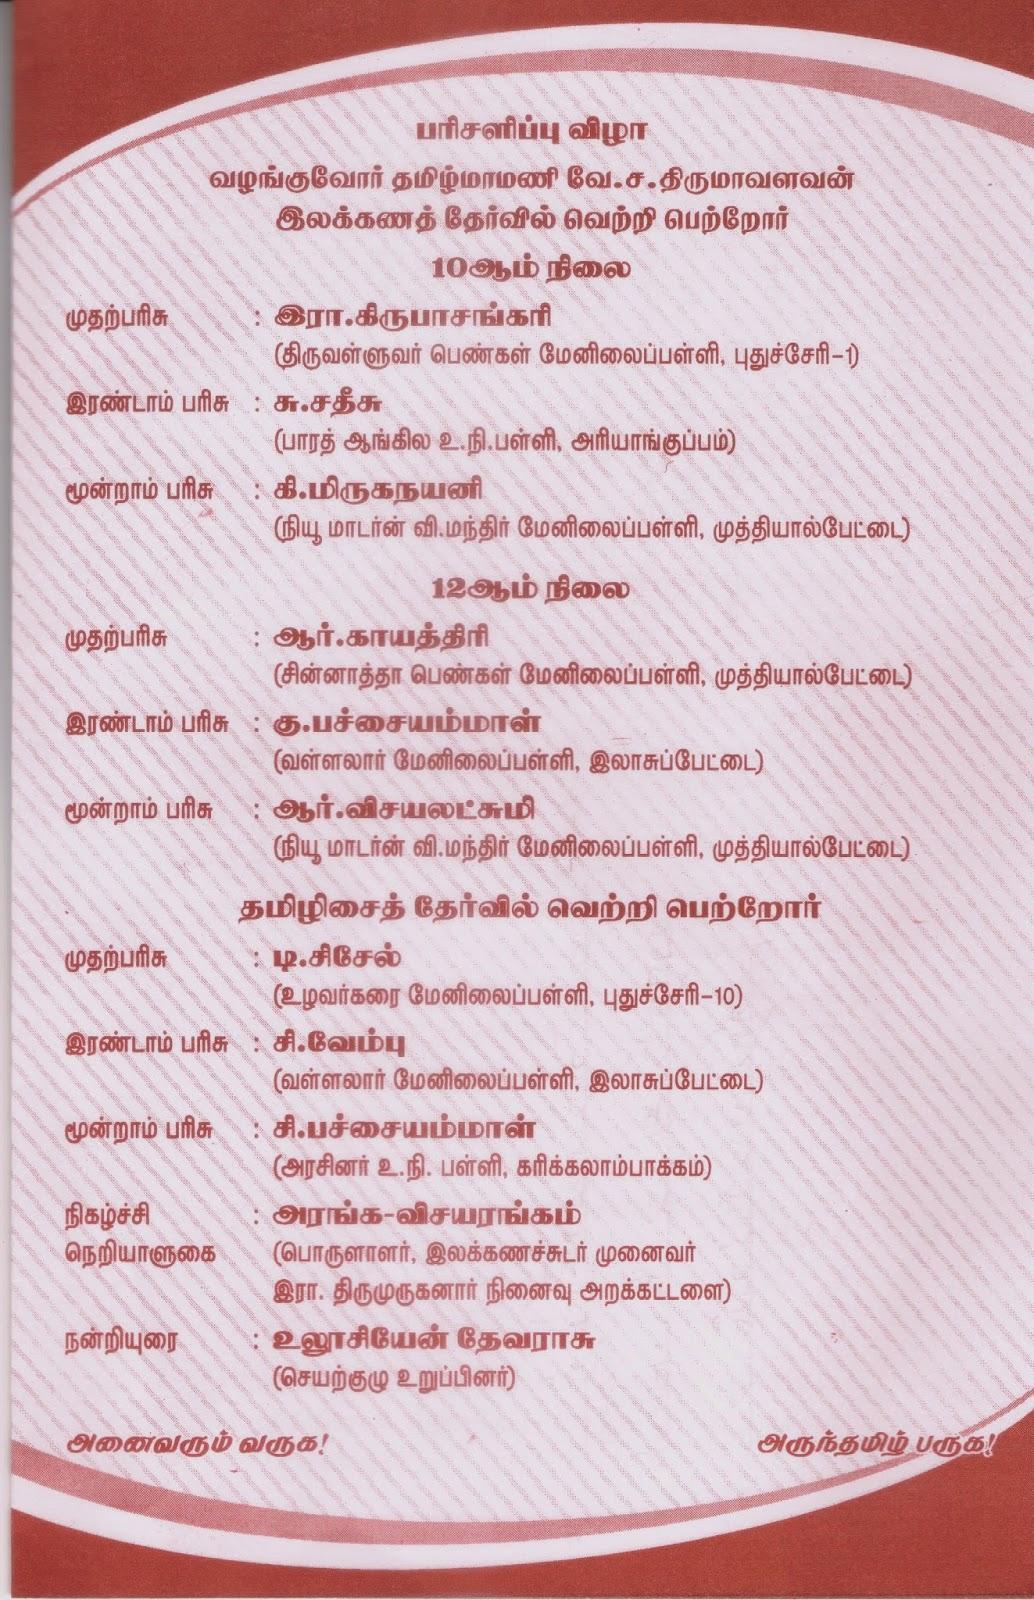 School Annual Function Invitation Card Matter In Hindi